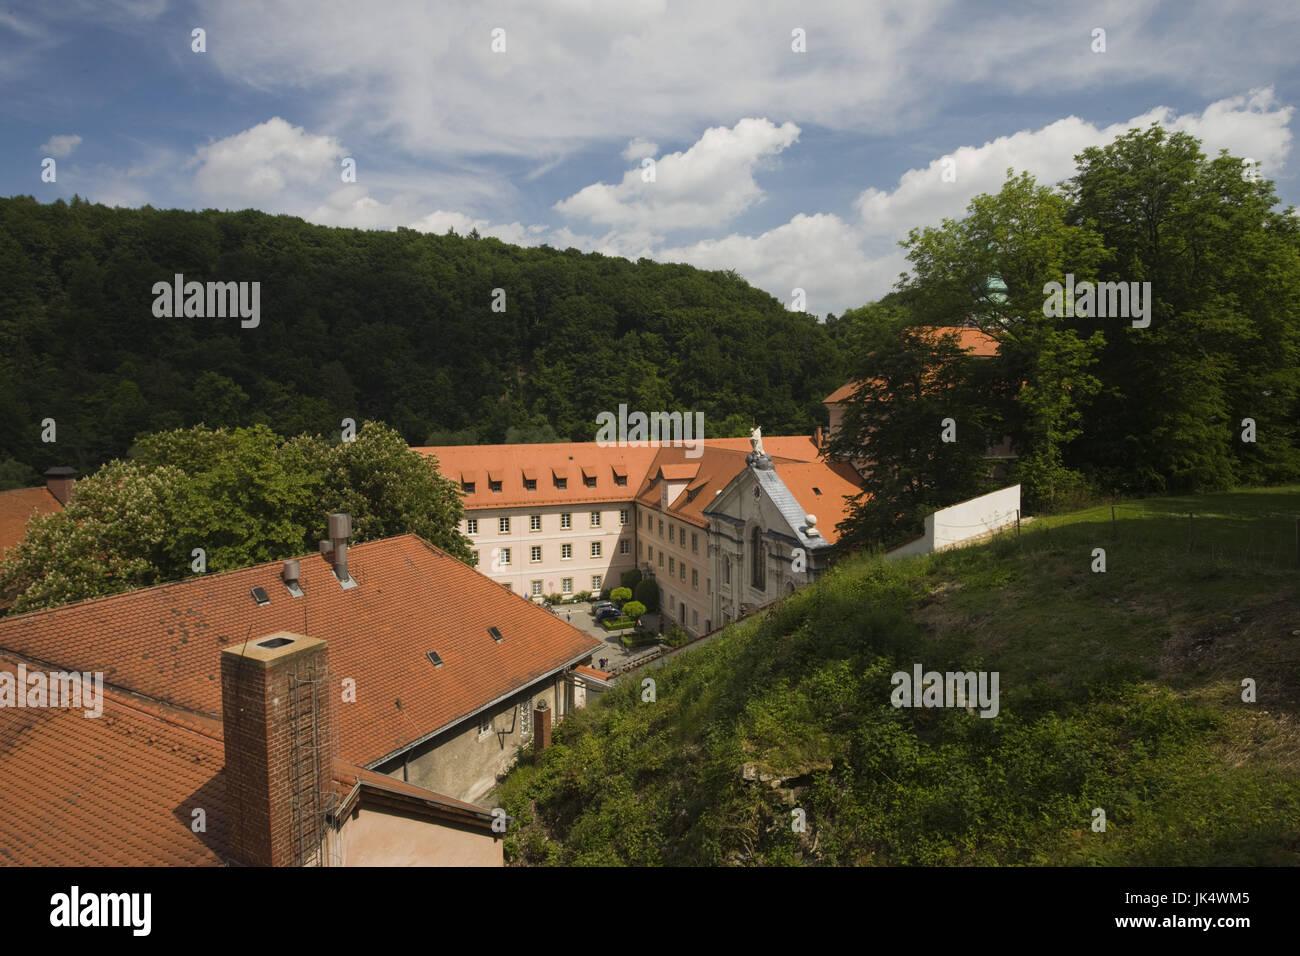 Danube Gorge Stock Photos & Danube Gorge Stock Images - Alamy